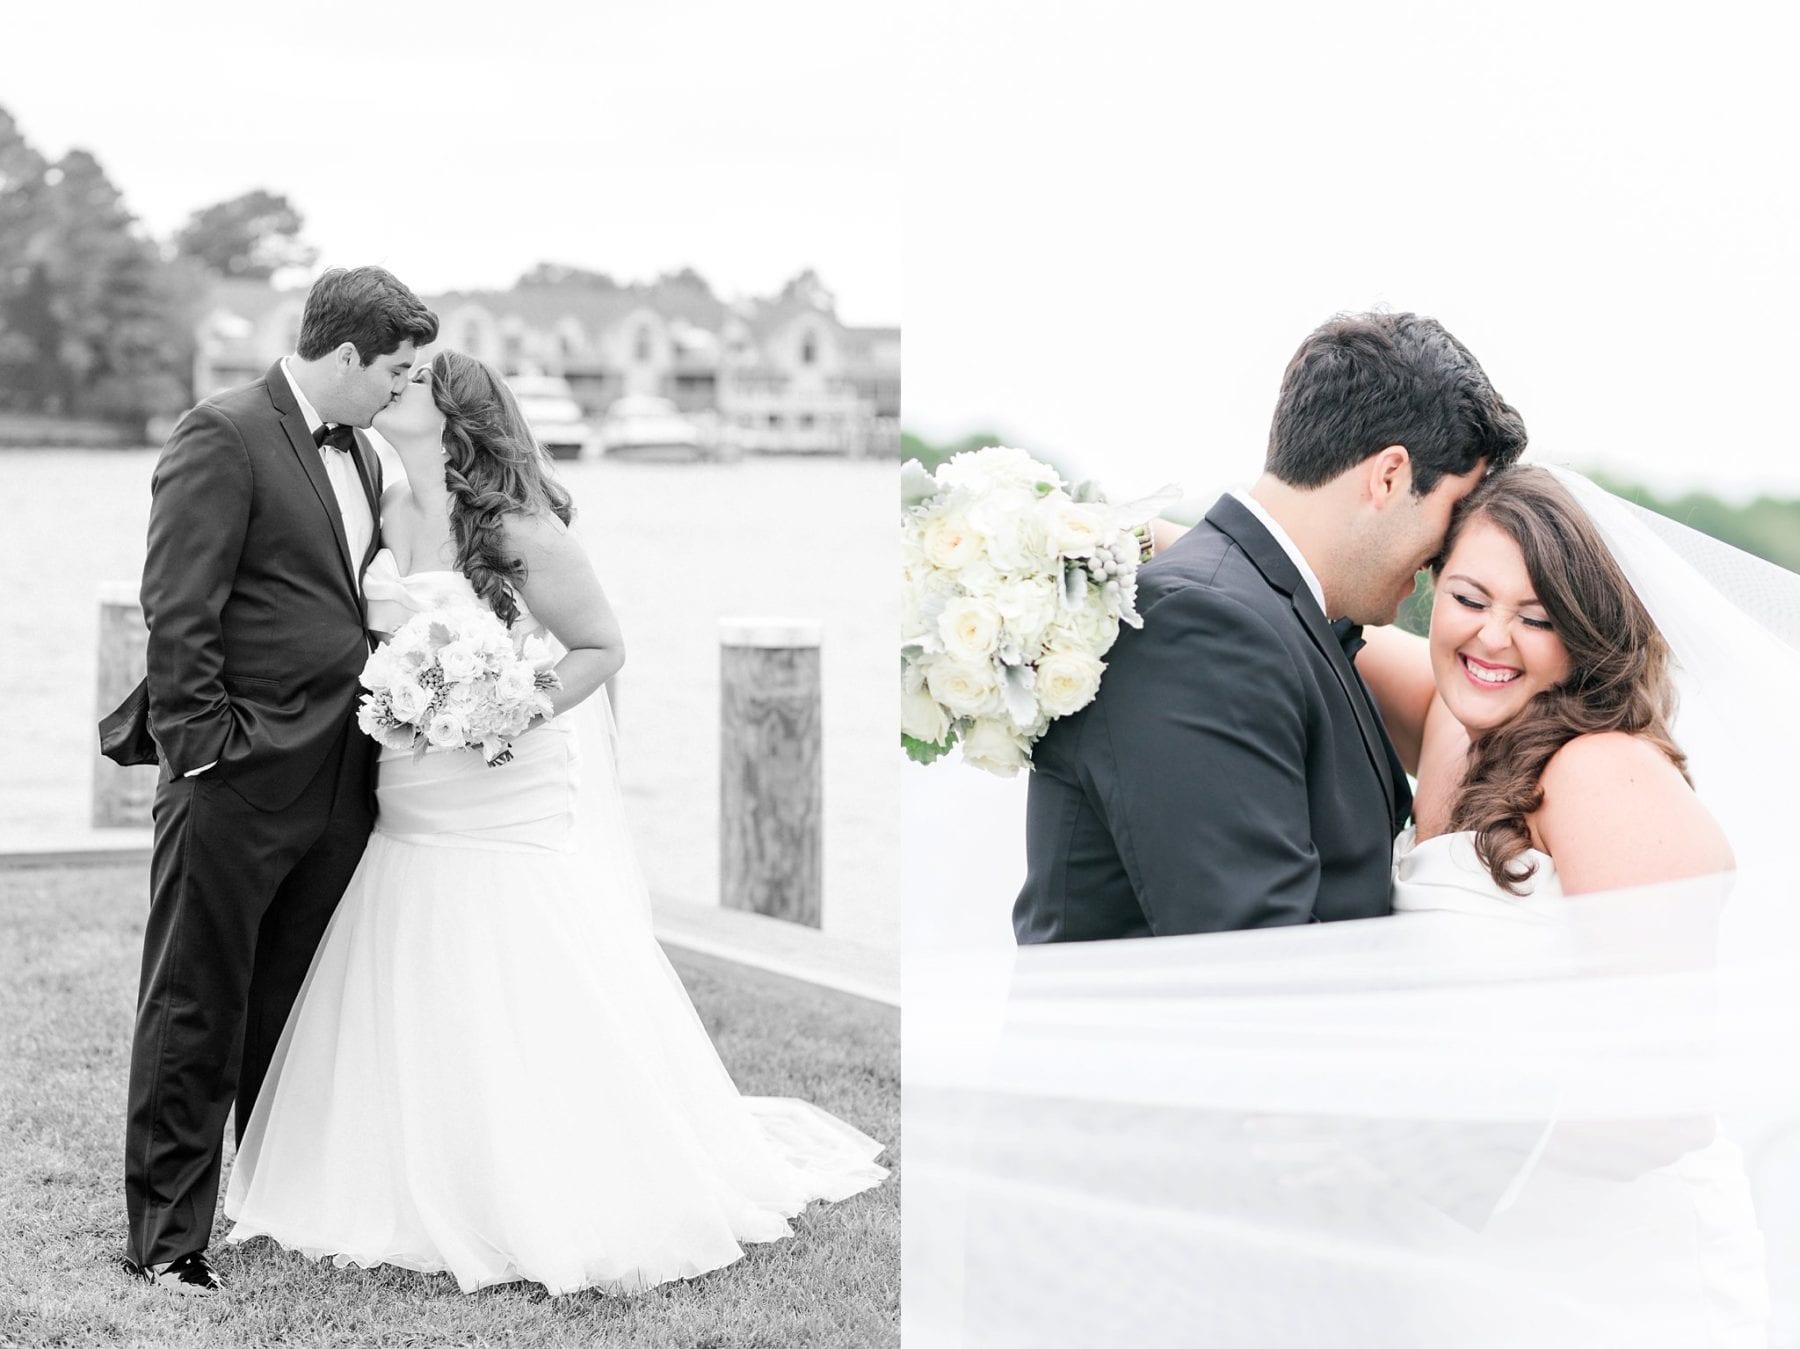 Chesapeake Bay Maritime Museum Wedding Photos Maryland Wedding Photographer Megan Kelsey Photography Halie & Mike-56.jpg